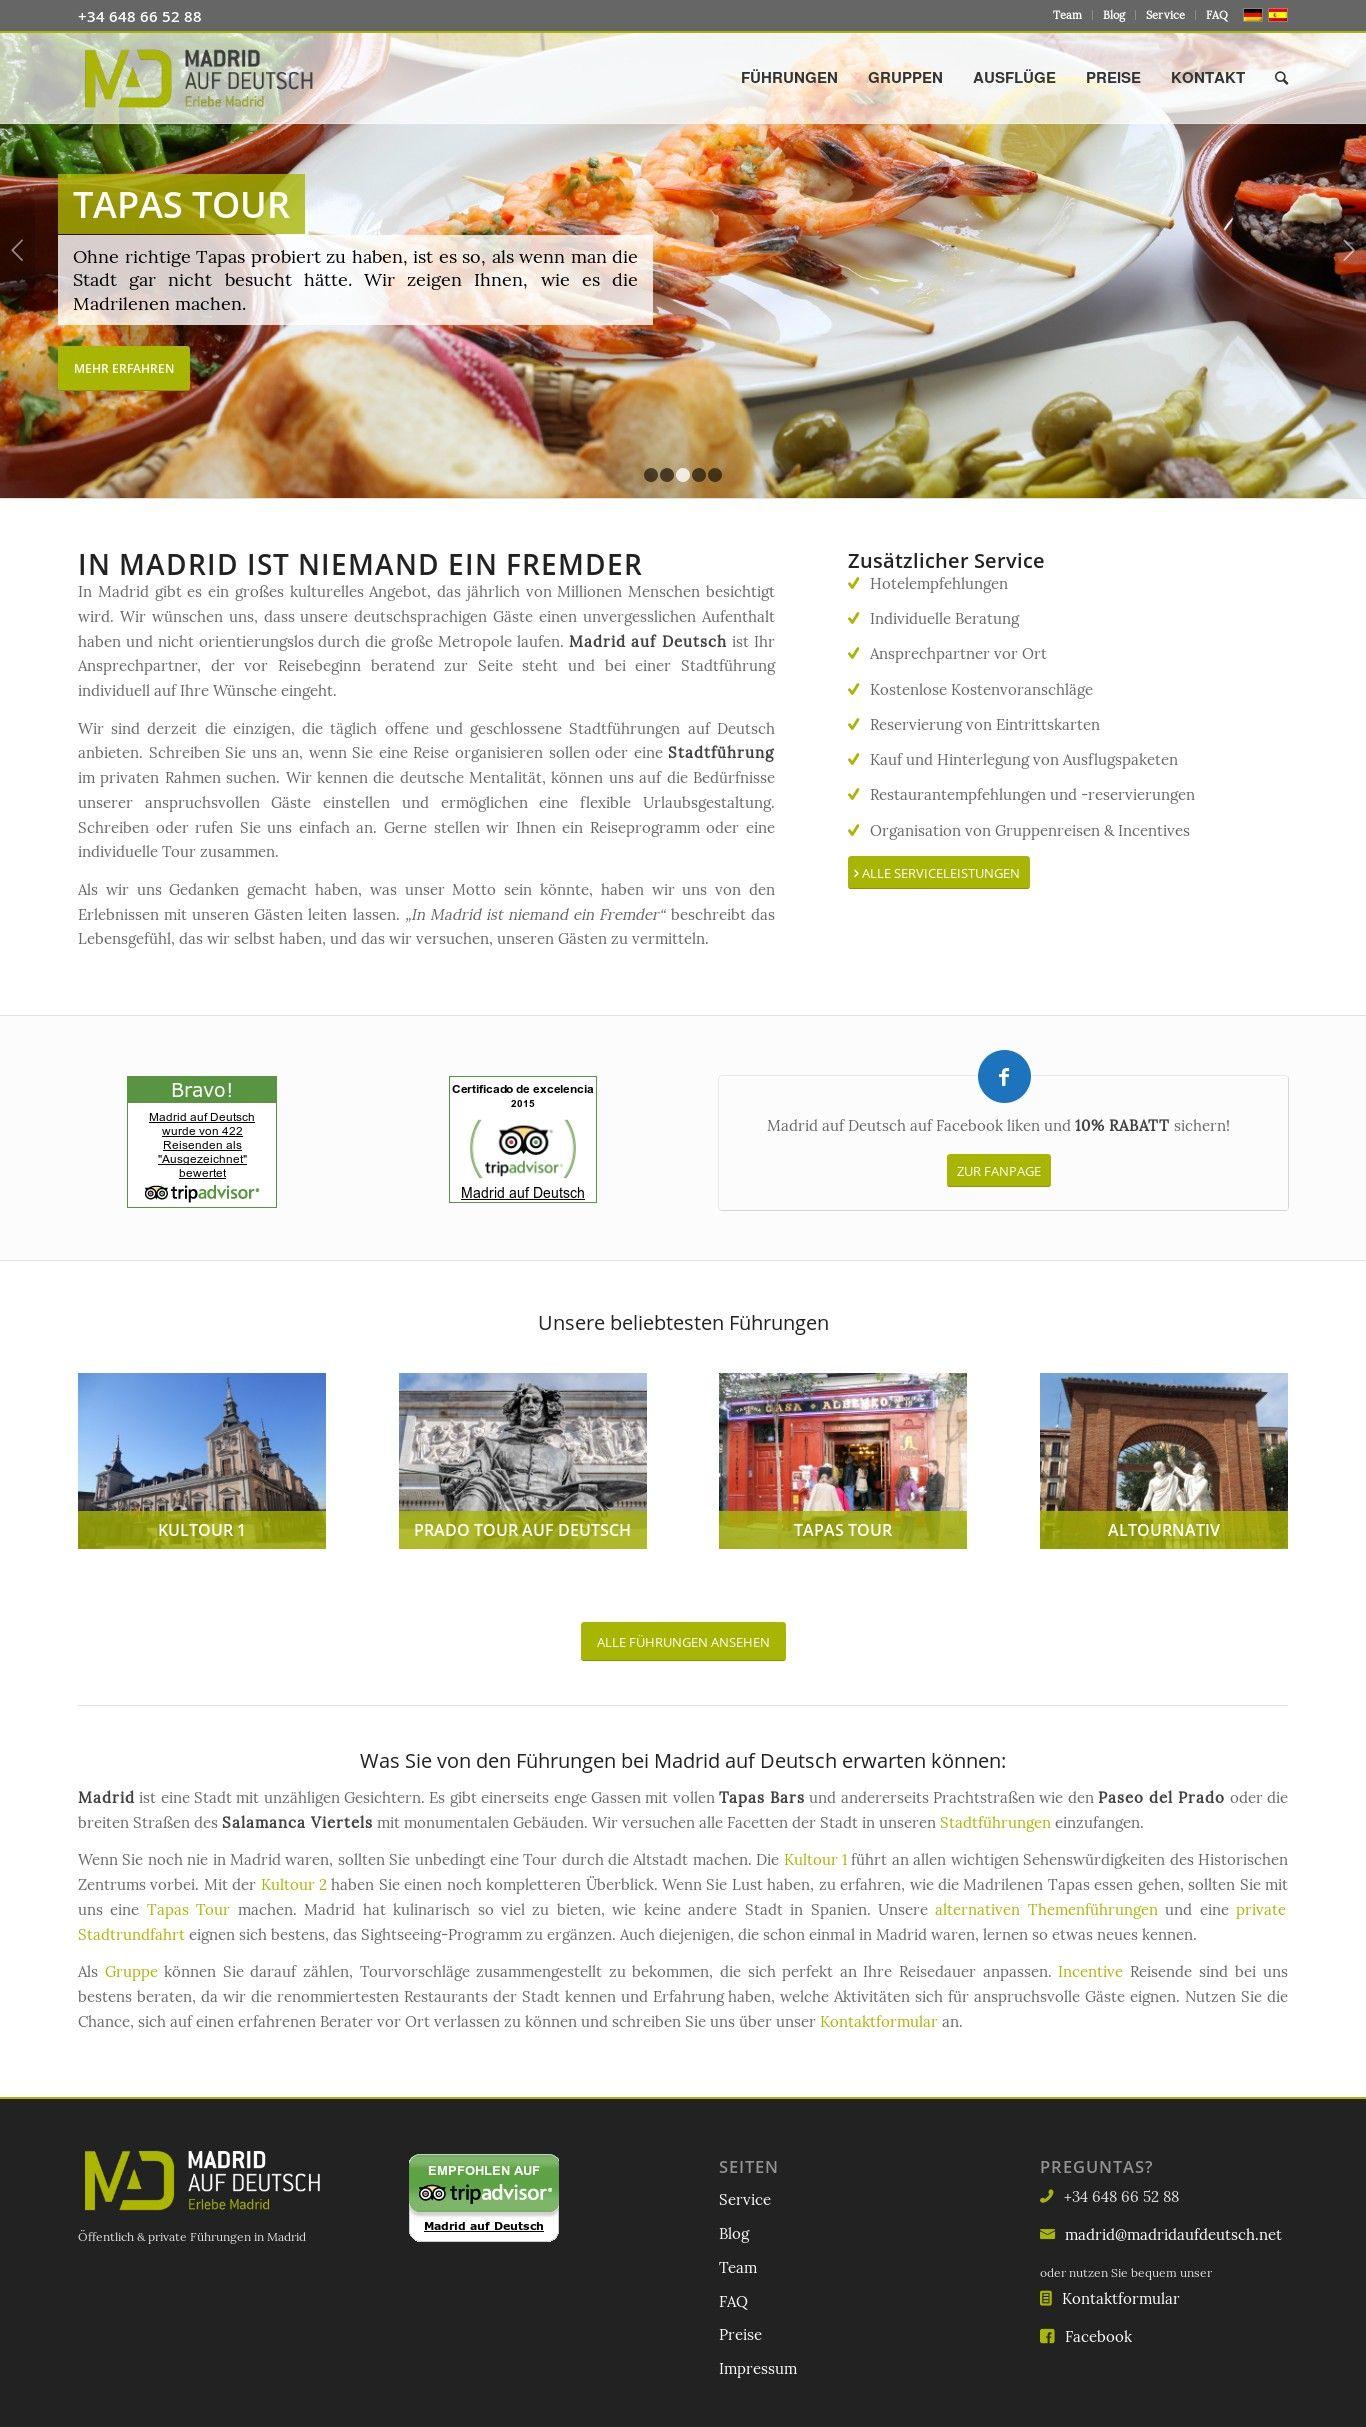 WordPress site madridaufdeutsch.net uses the Wordpress template ...